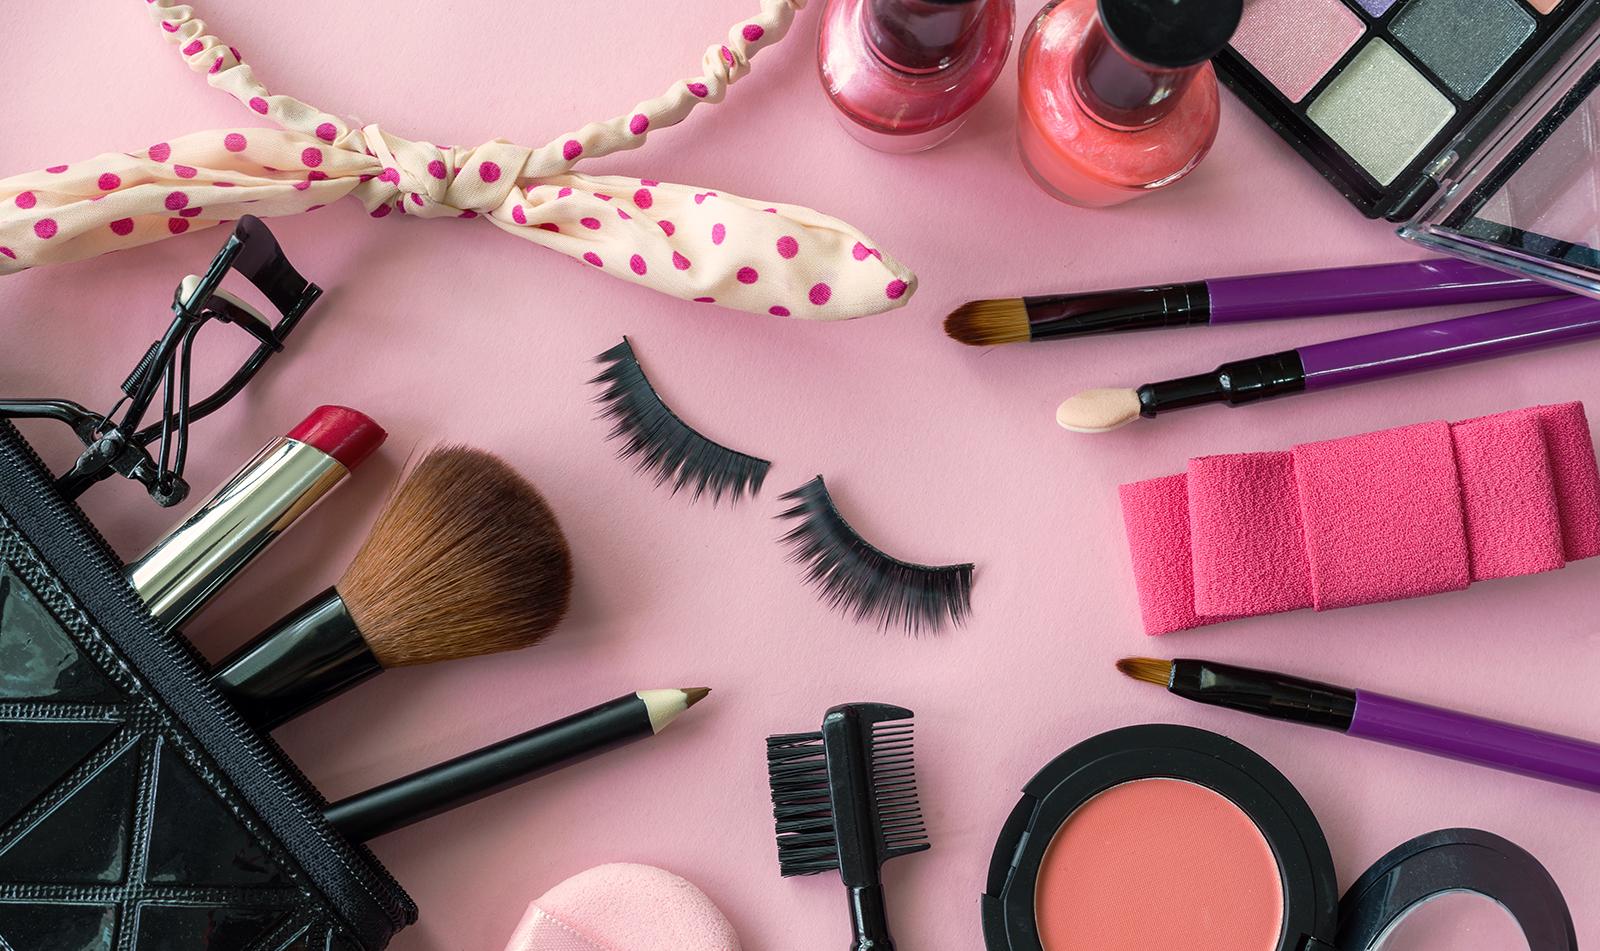 makeup-kit-makeup-items-laid-around-a-pink-background